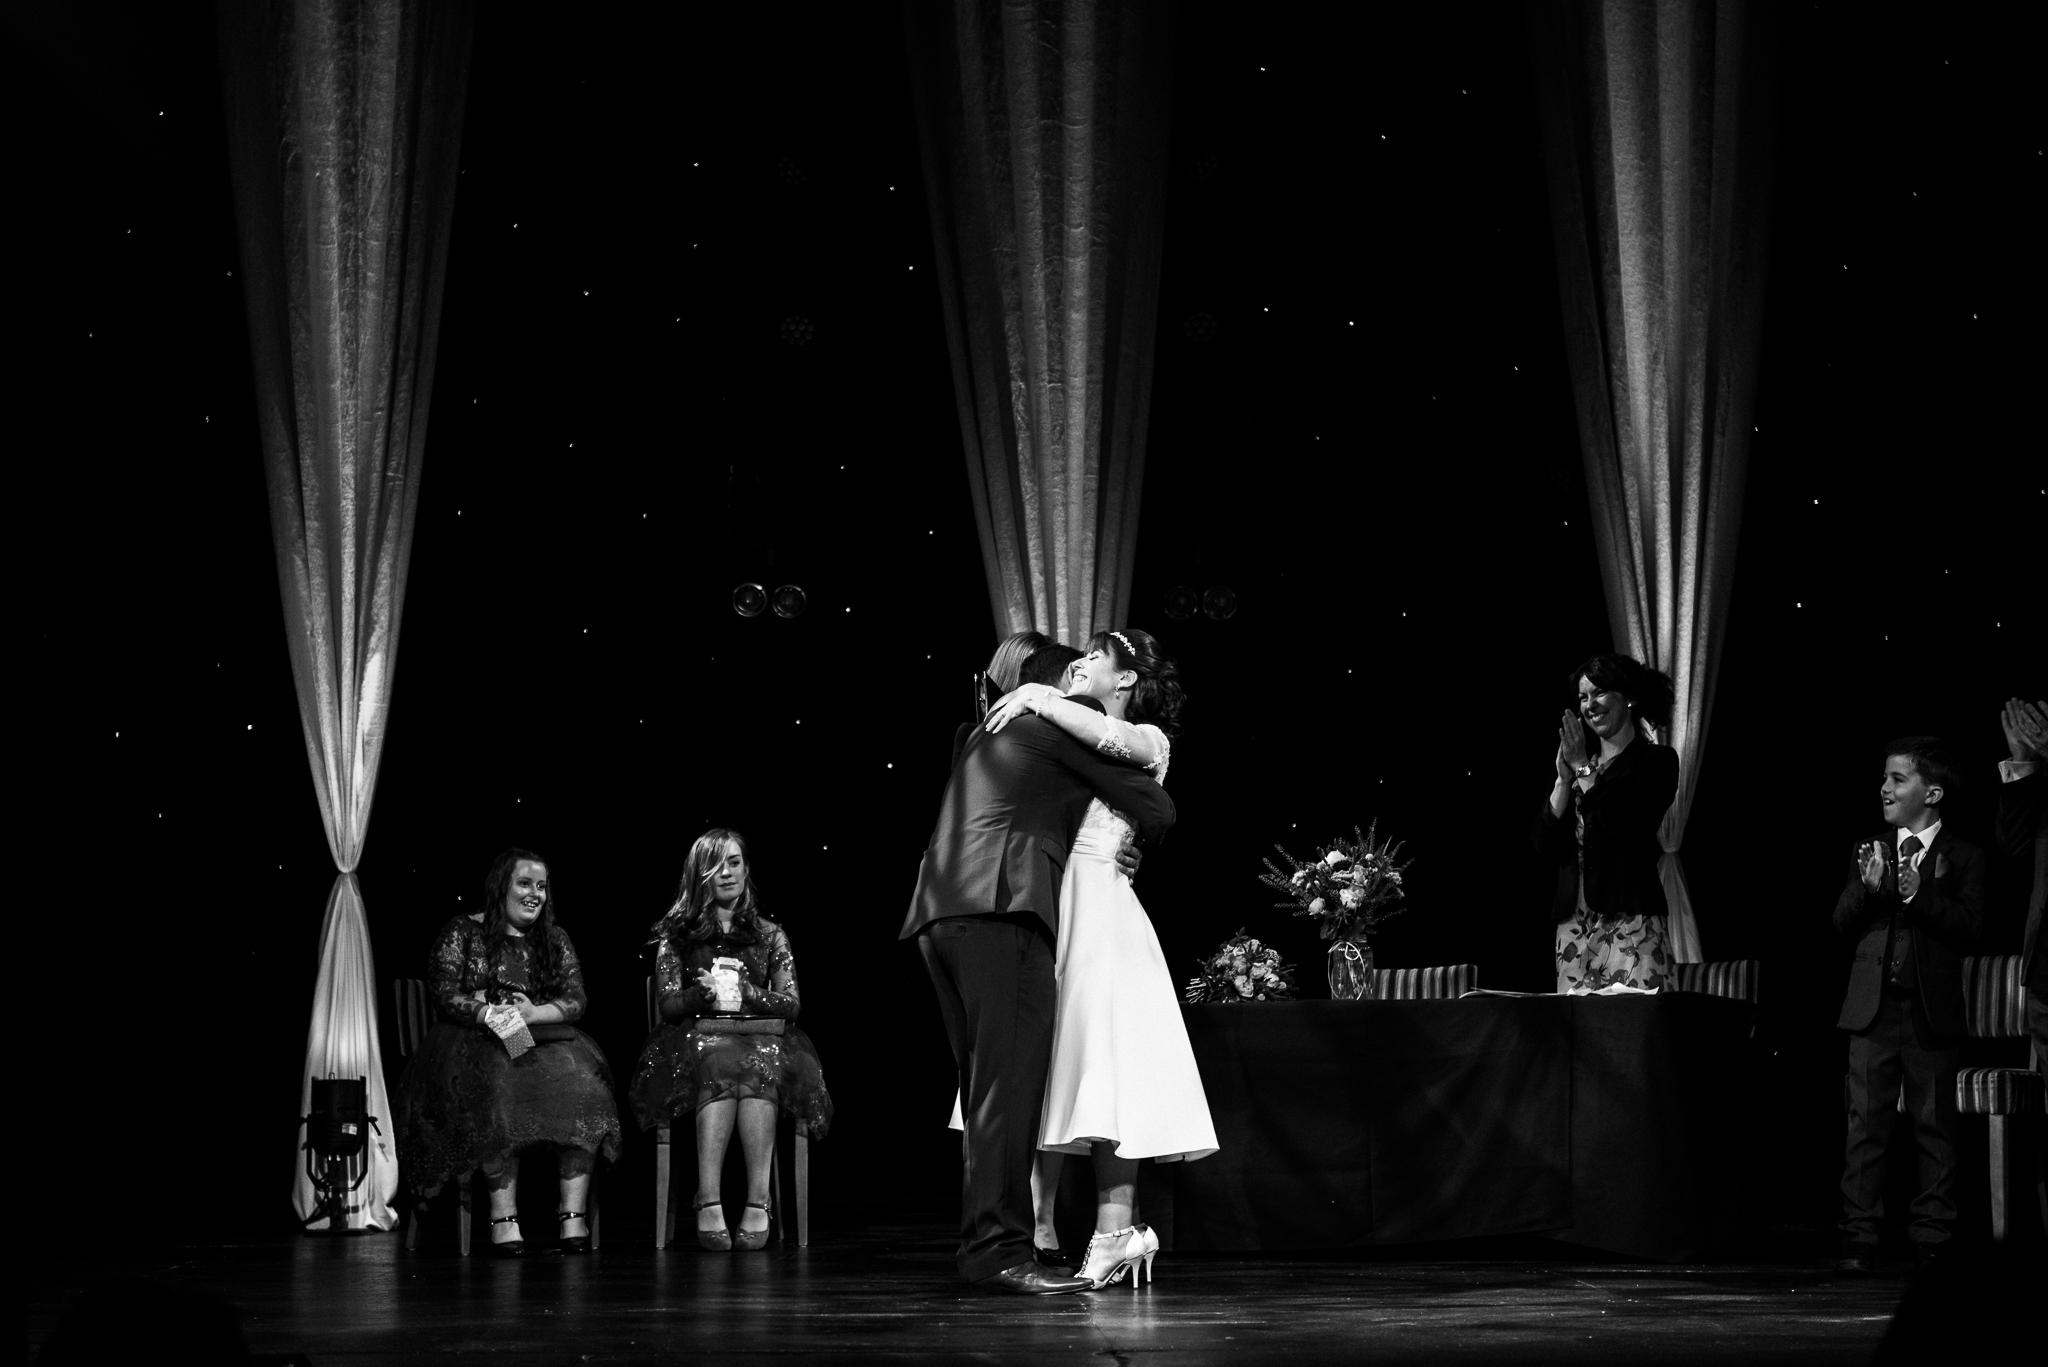 Cheshire Wedding Photography at Crewe Lyceum Theatre Stage Wedding Art Deco 20s - Jenny Harper-23.jpg